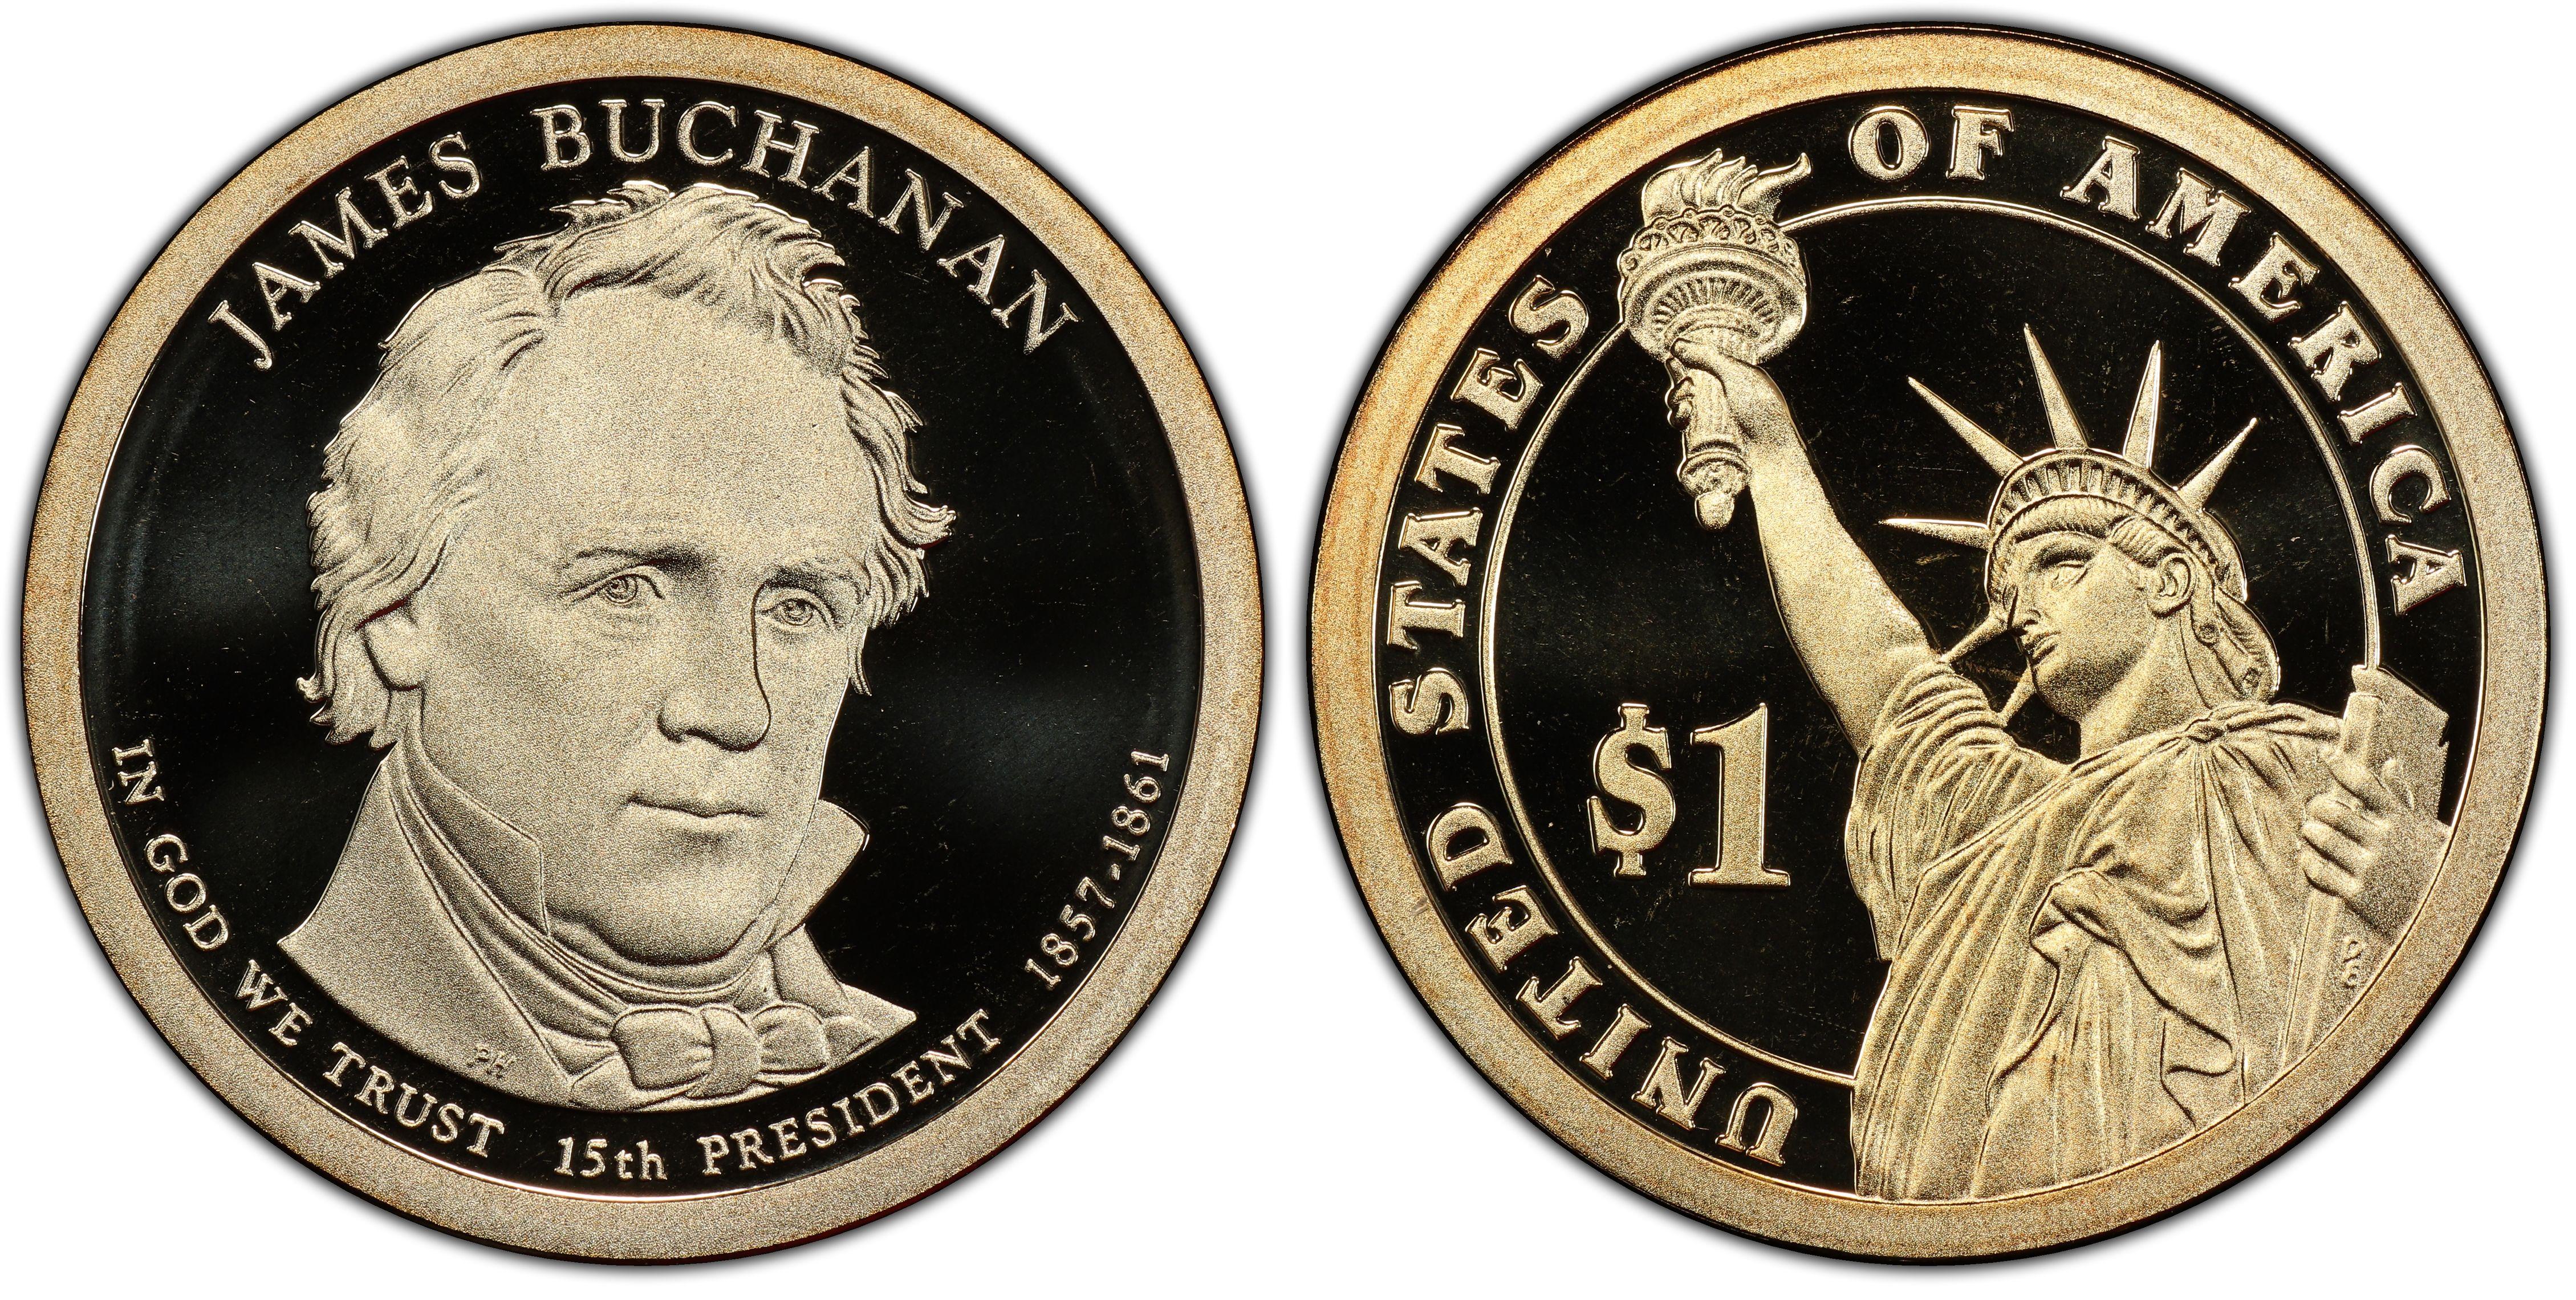 2010-S PCGS PR69DCAM James Buchanan Presidential Dollar